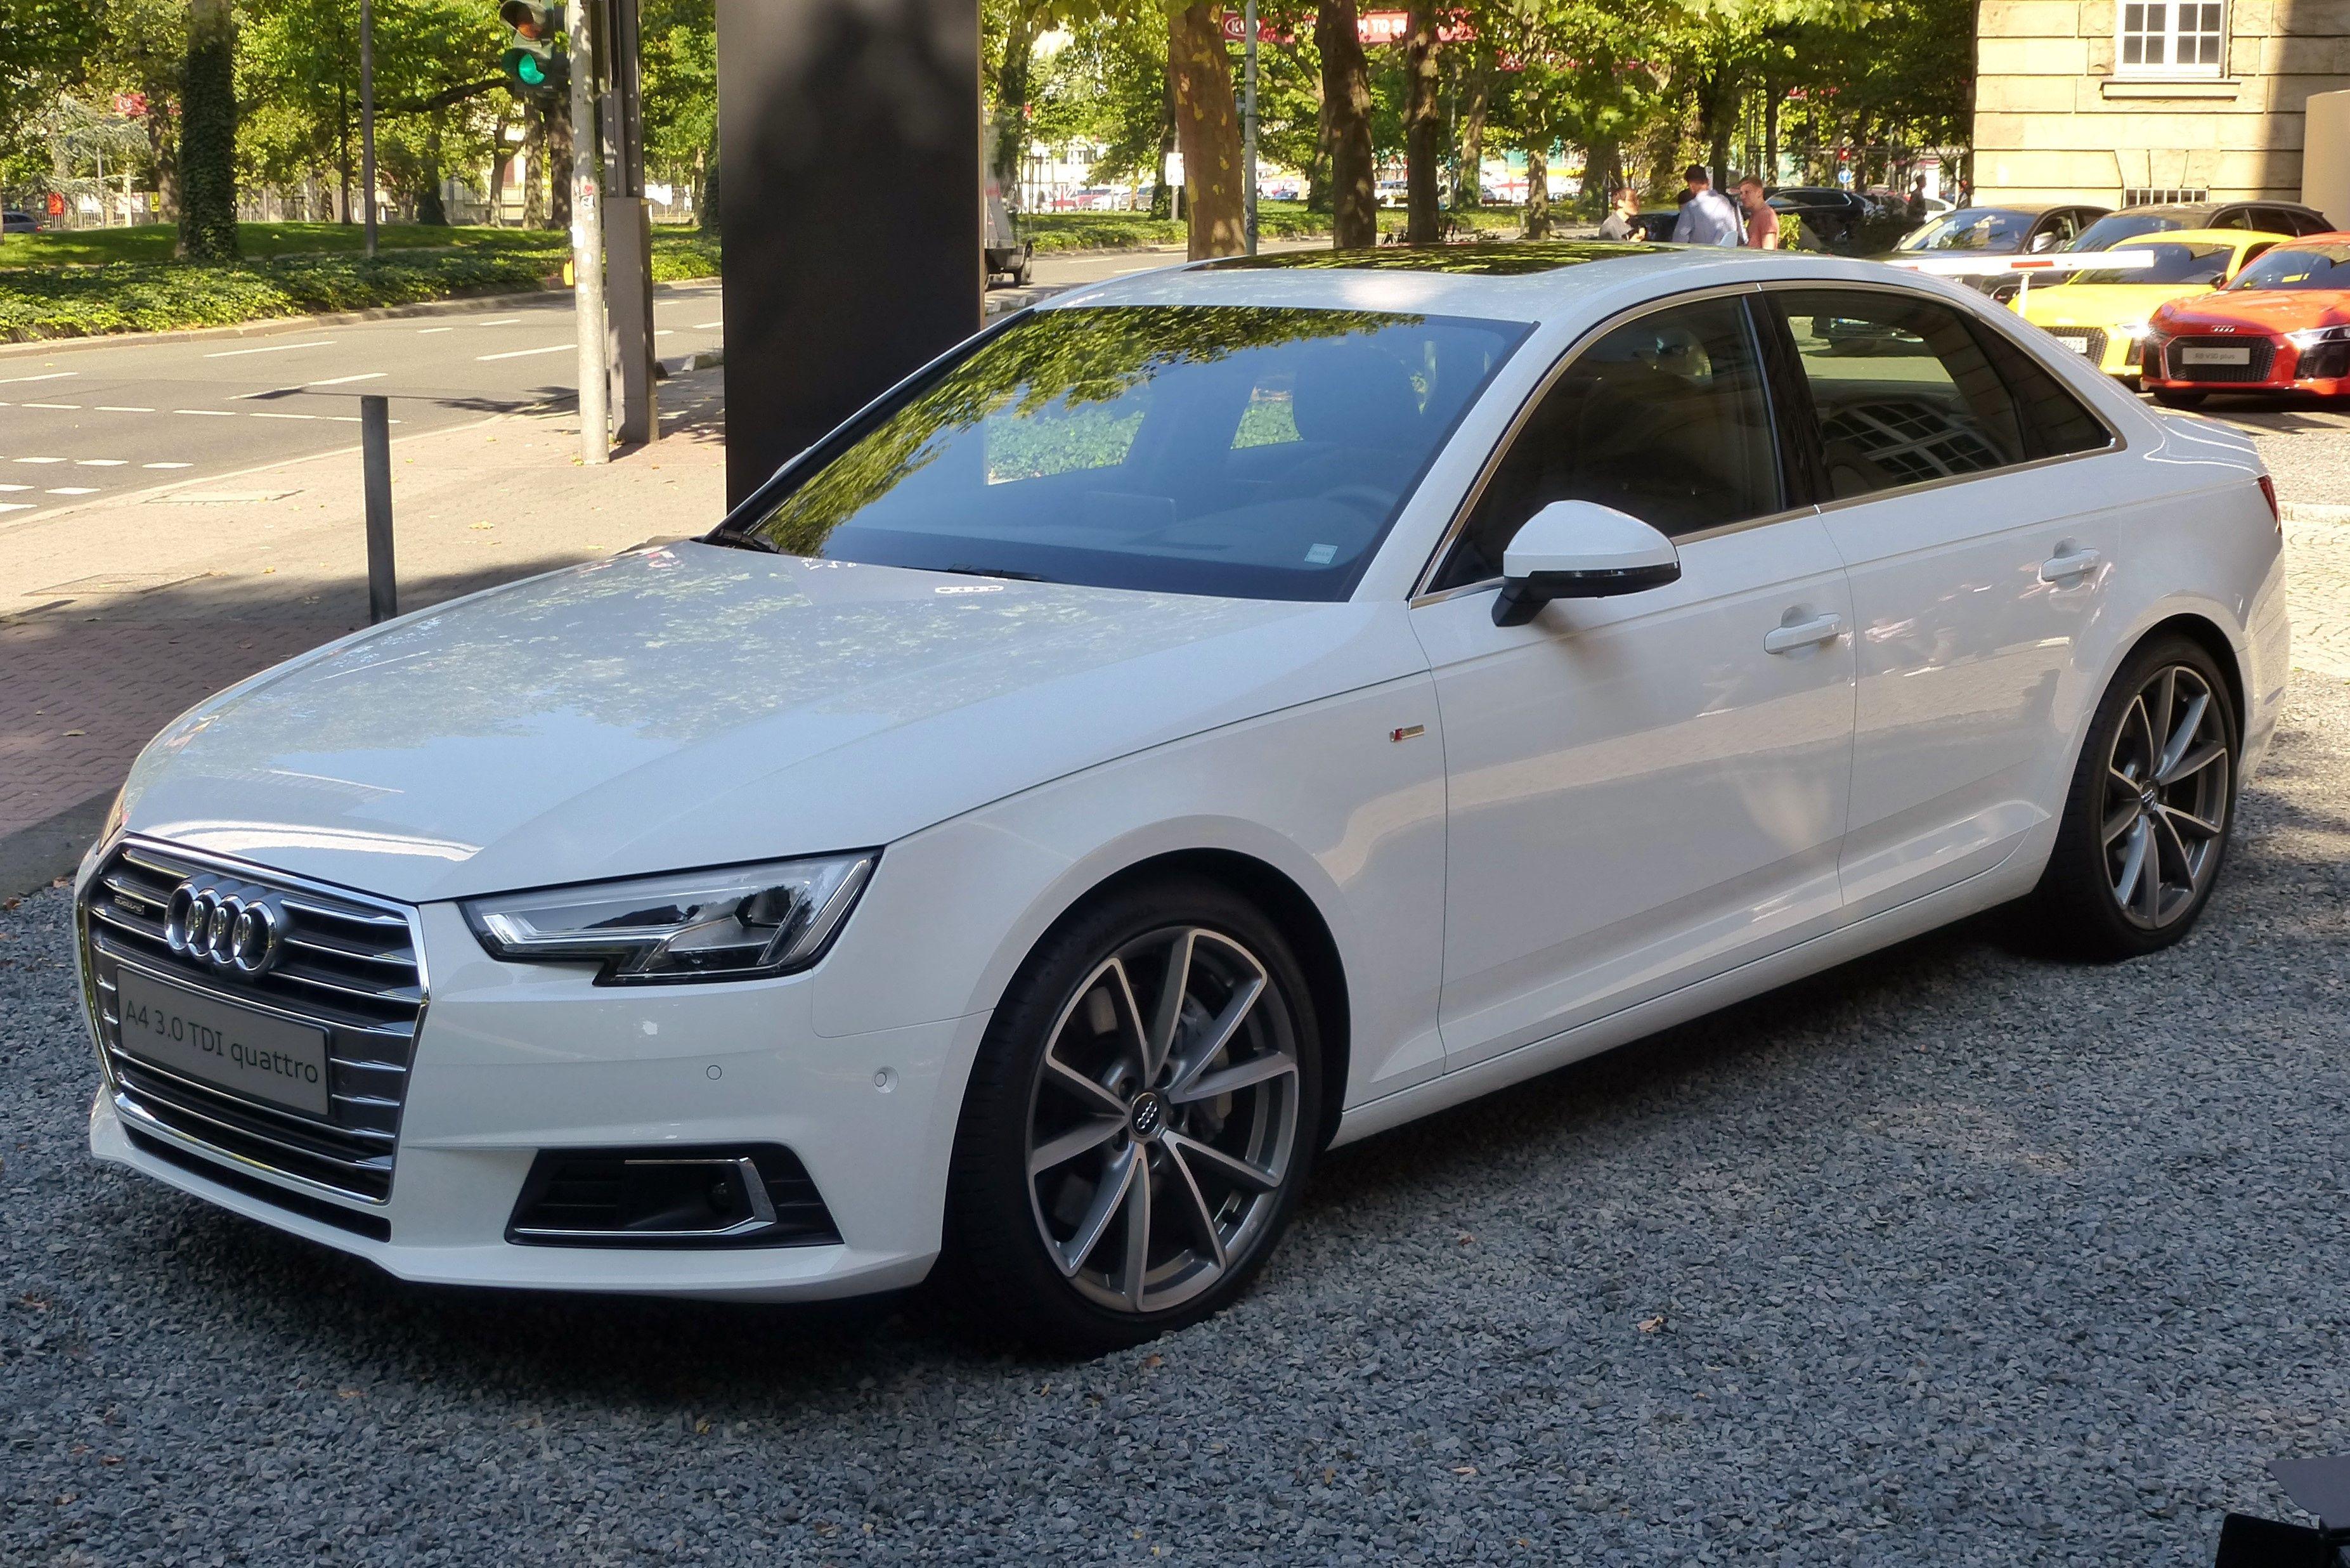 Audi A4 2018 Audi A4 Audi Wagon Audi